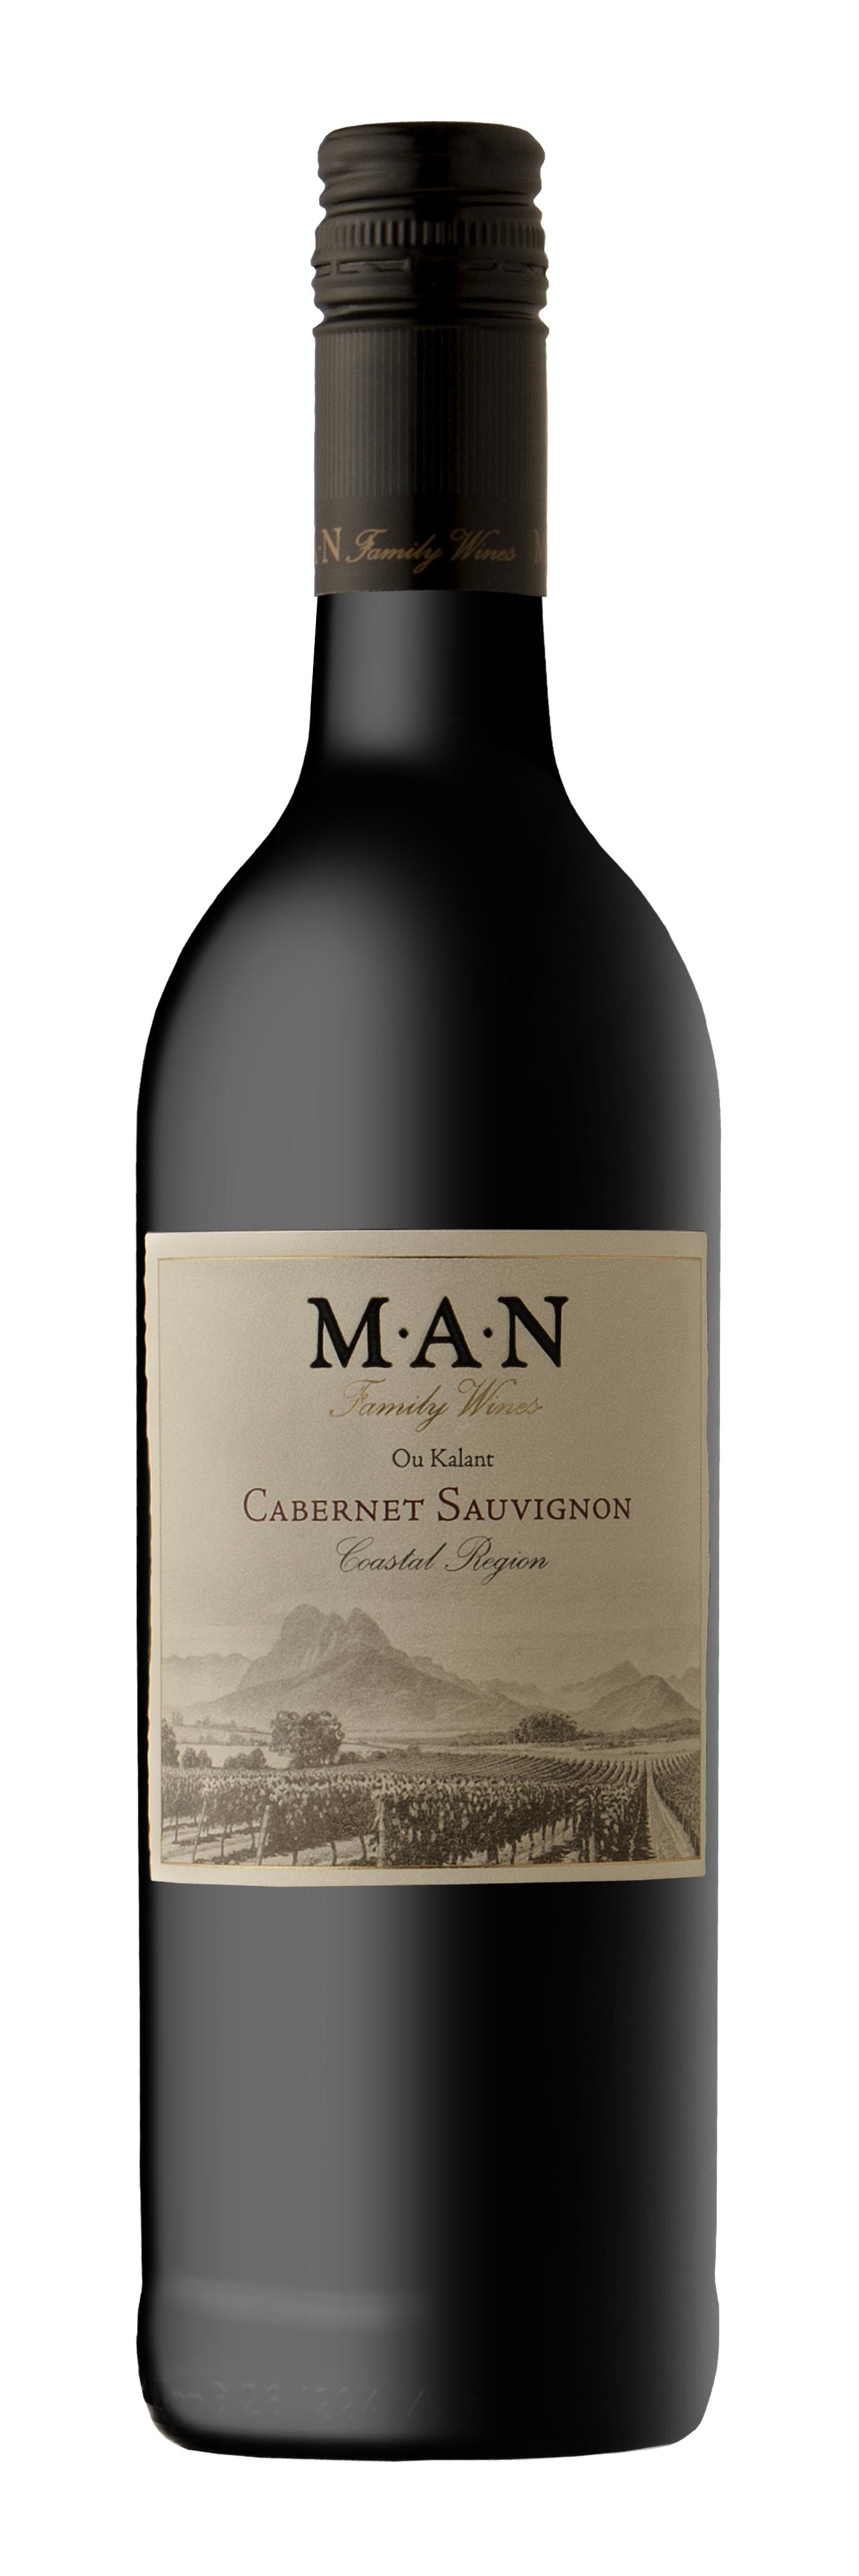 man_family_wines_cabernet_sauvignon.jpg